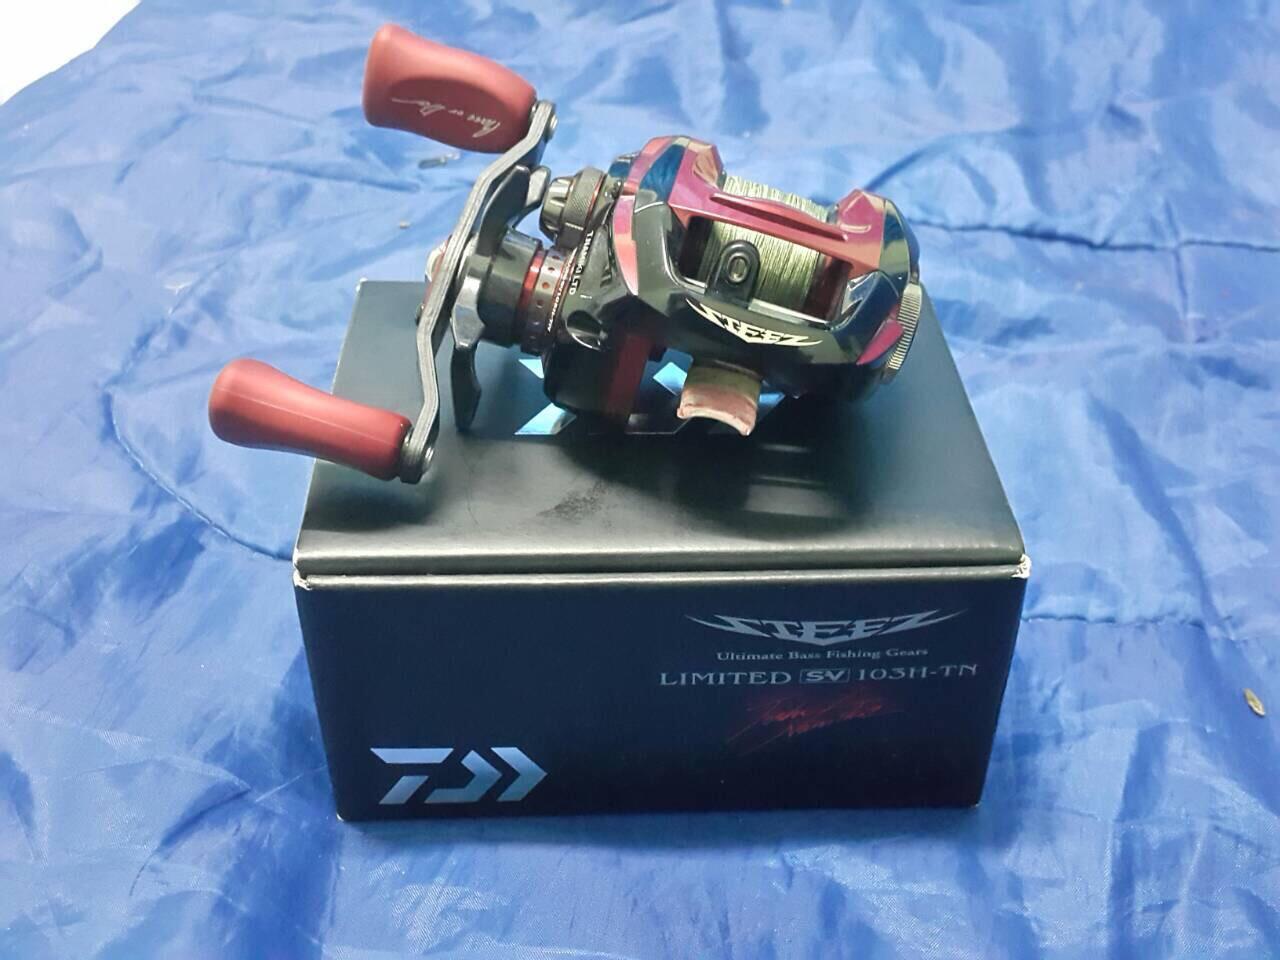 Steez Limited SV 103H - Toshi Namikin ใครอยากเห็นข้างใน ยกมือขึ้น....ll